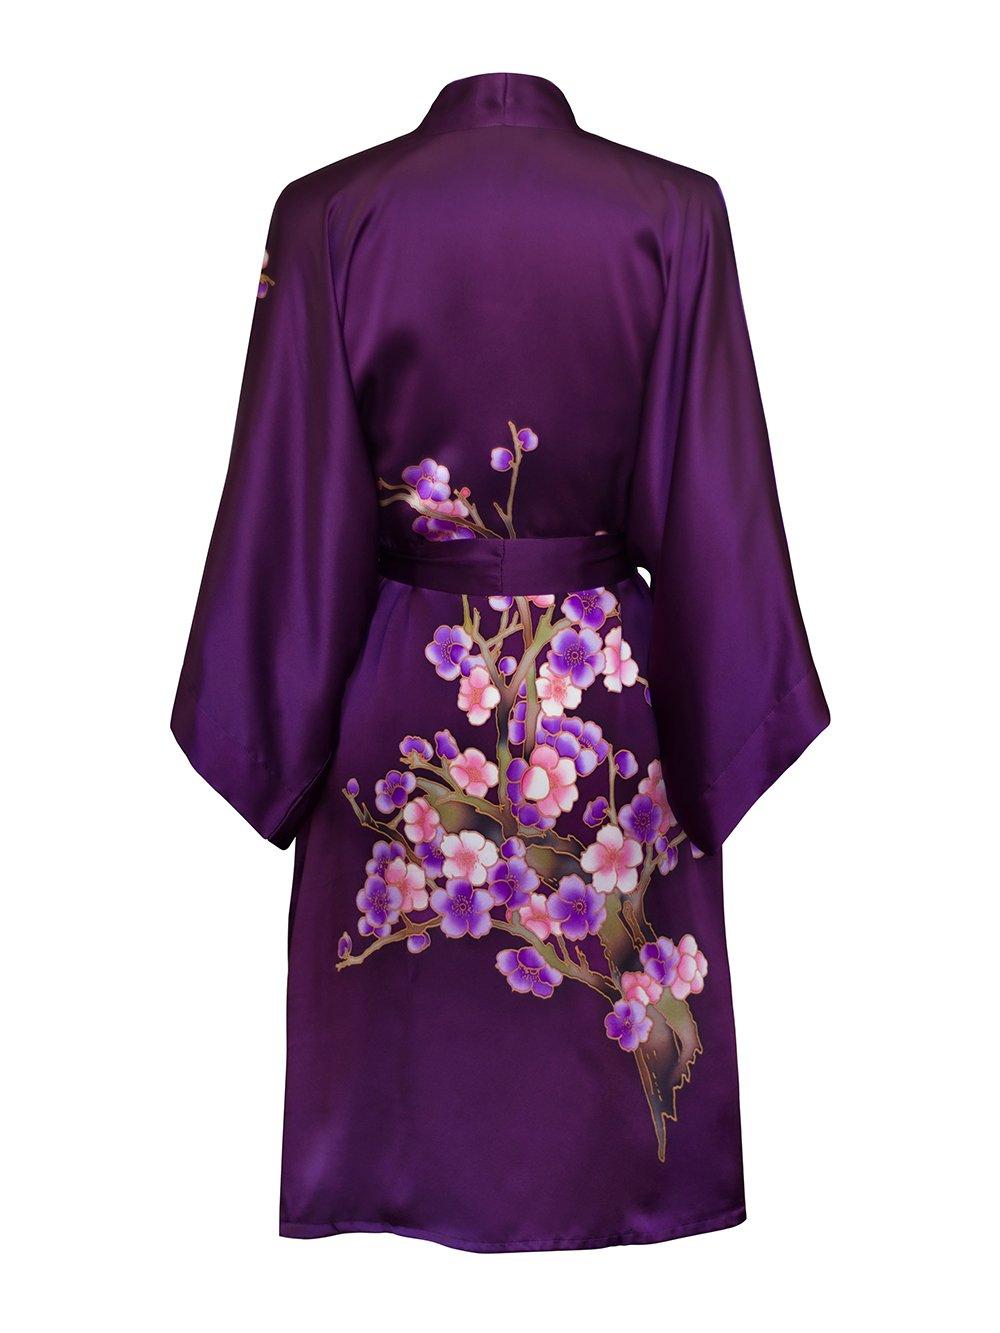 Old Shanghai Women's Silk Kimono Short Robe - Handpainted (Cherry Blossom Plum) by Old Shanghai (Image #2)